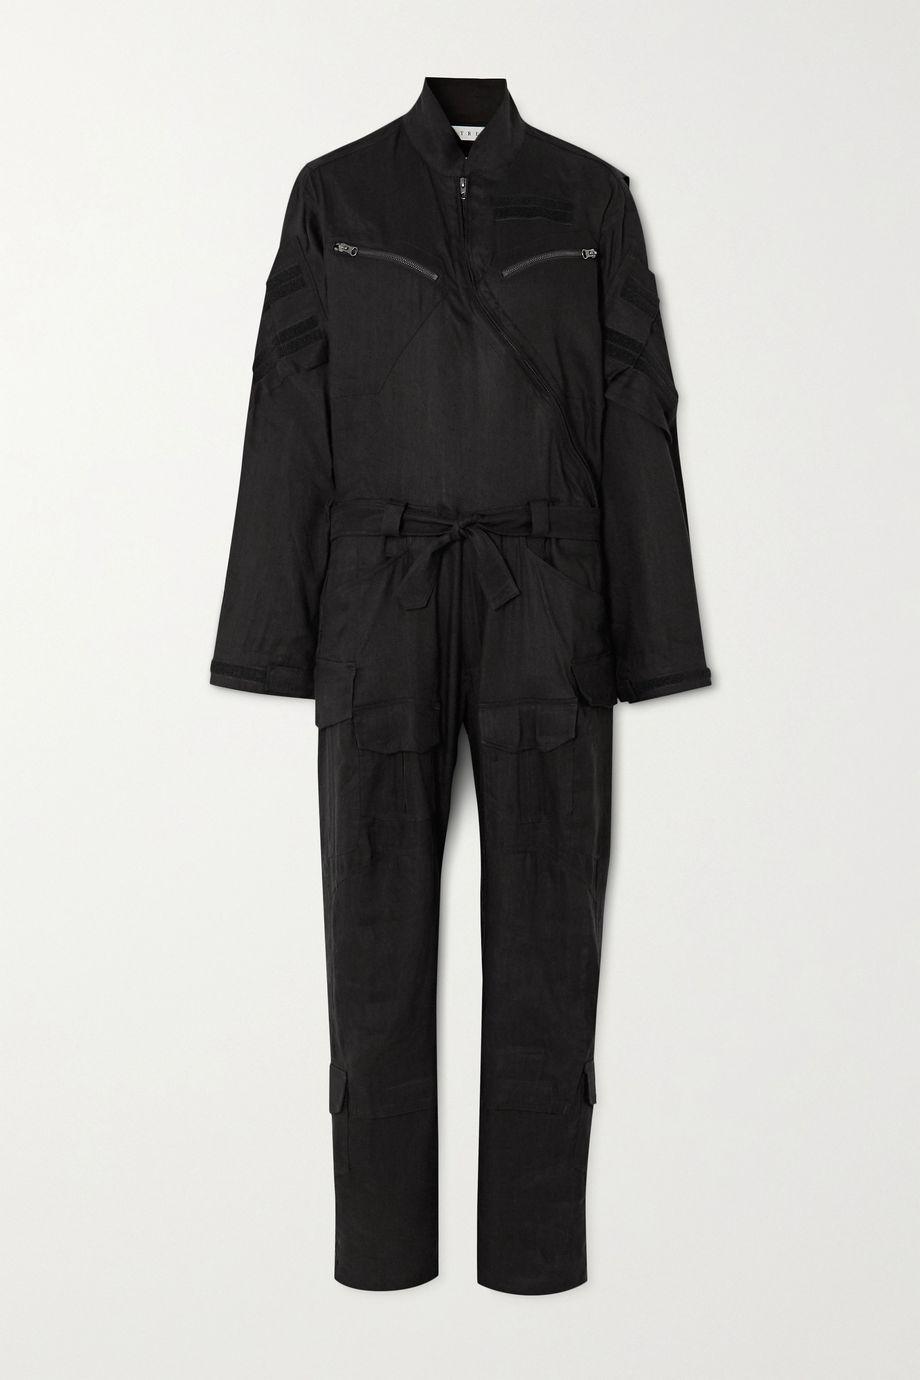 TRE by Natalie Ratabesi Belted linen-blend twill jumpsuit